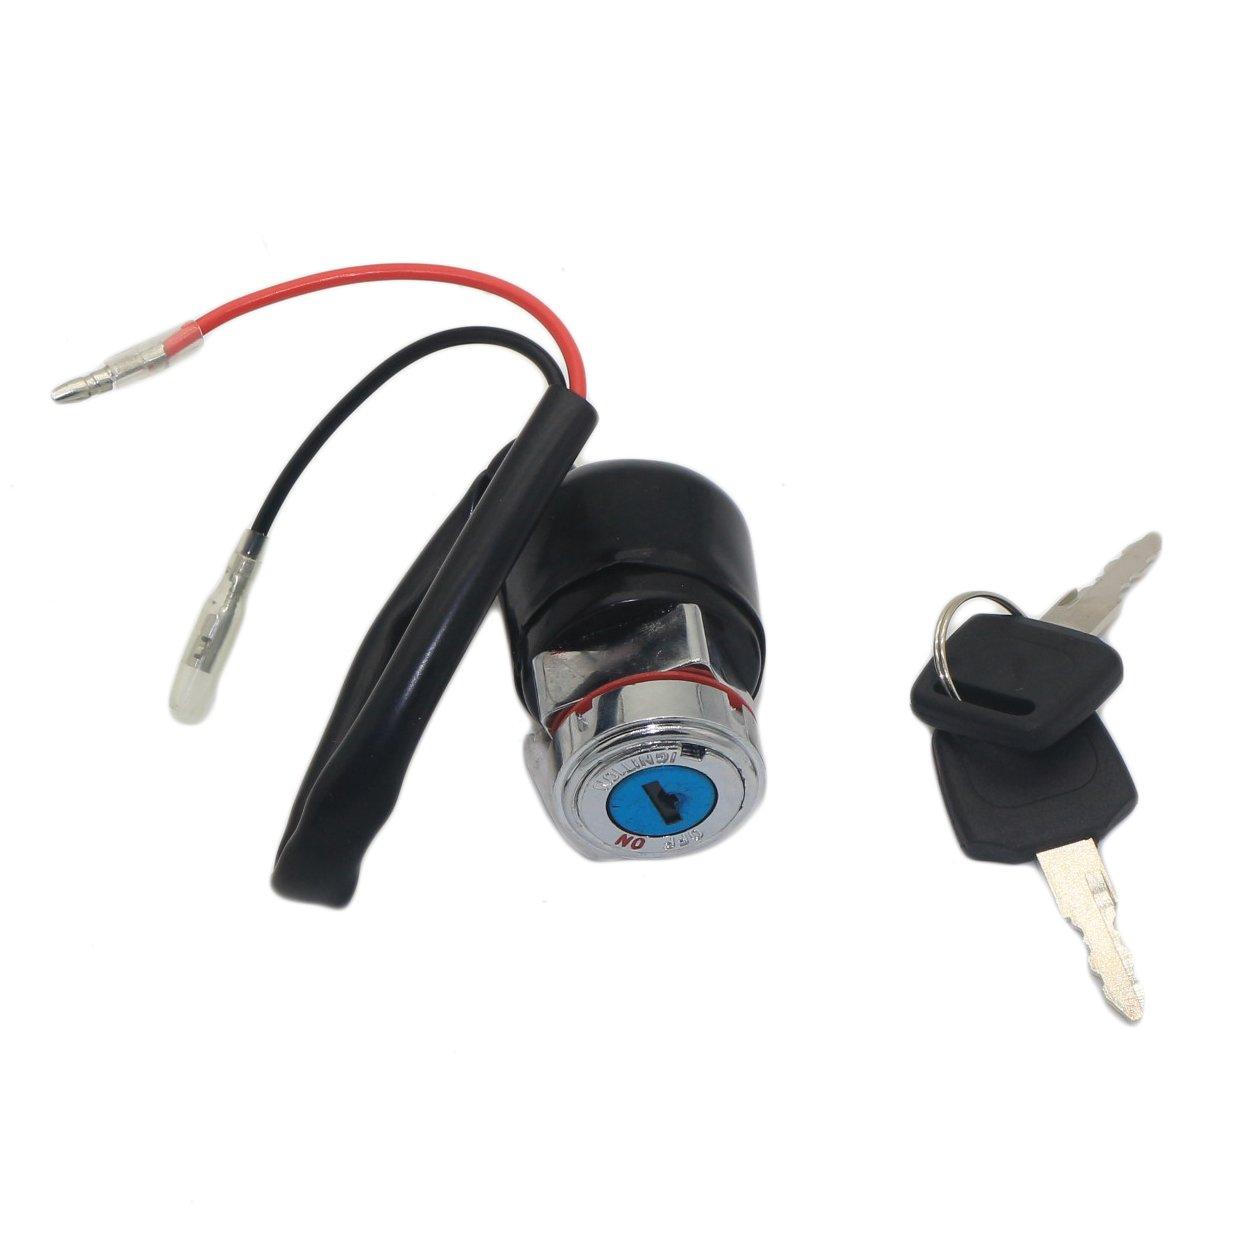 JINGKE Black Ignition Key Switch For Honda CL70 CB100 CB125S CL100 XL100 NEW JINGKE-DMS